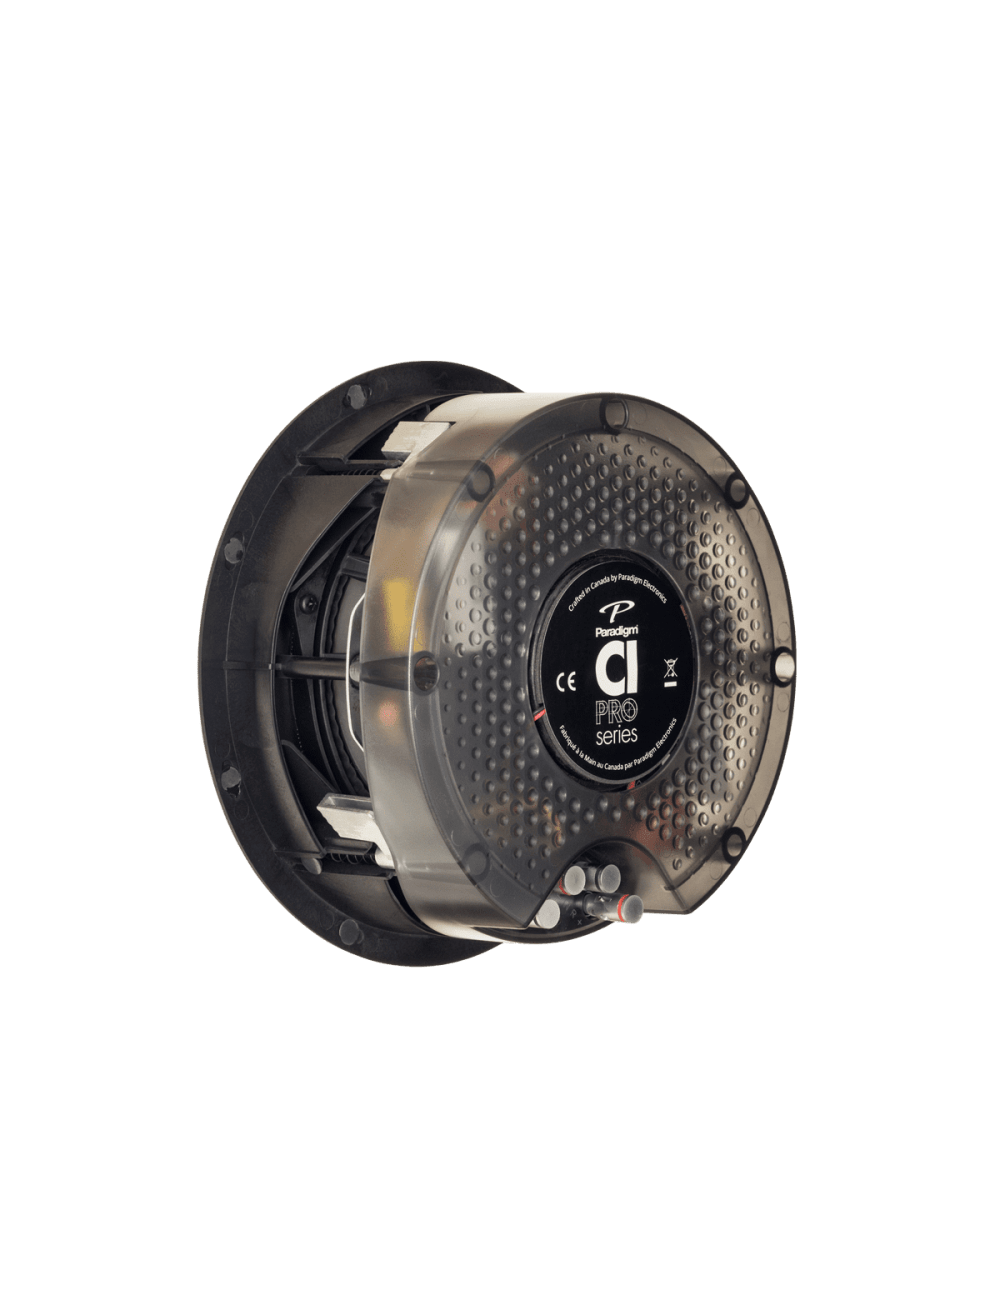 diffusore acustico da incasso a parete o a soffitto, Paradigm CI PRO P80-SM, vista posteriore